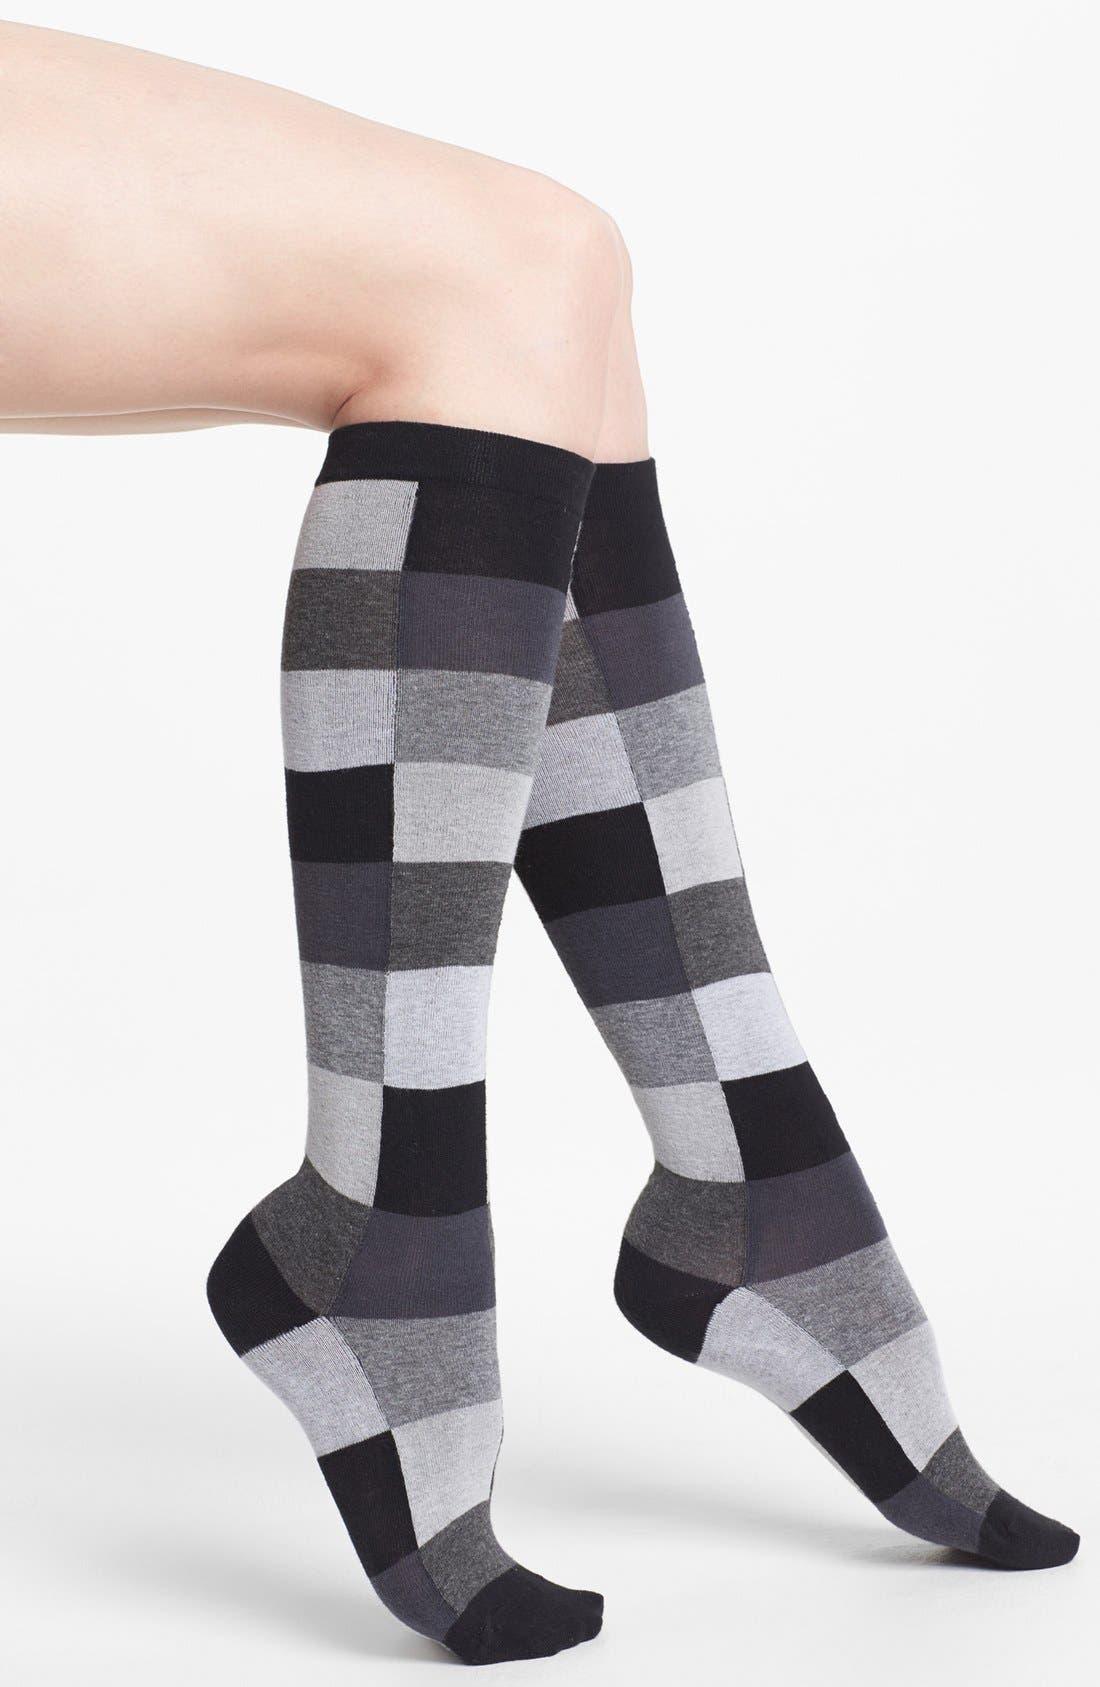 Alternate Image 1 Selected - Hue Colorblock Knee High Socks